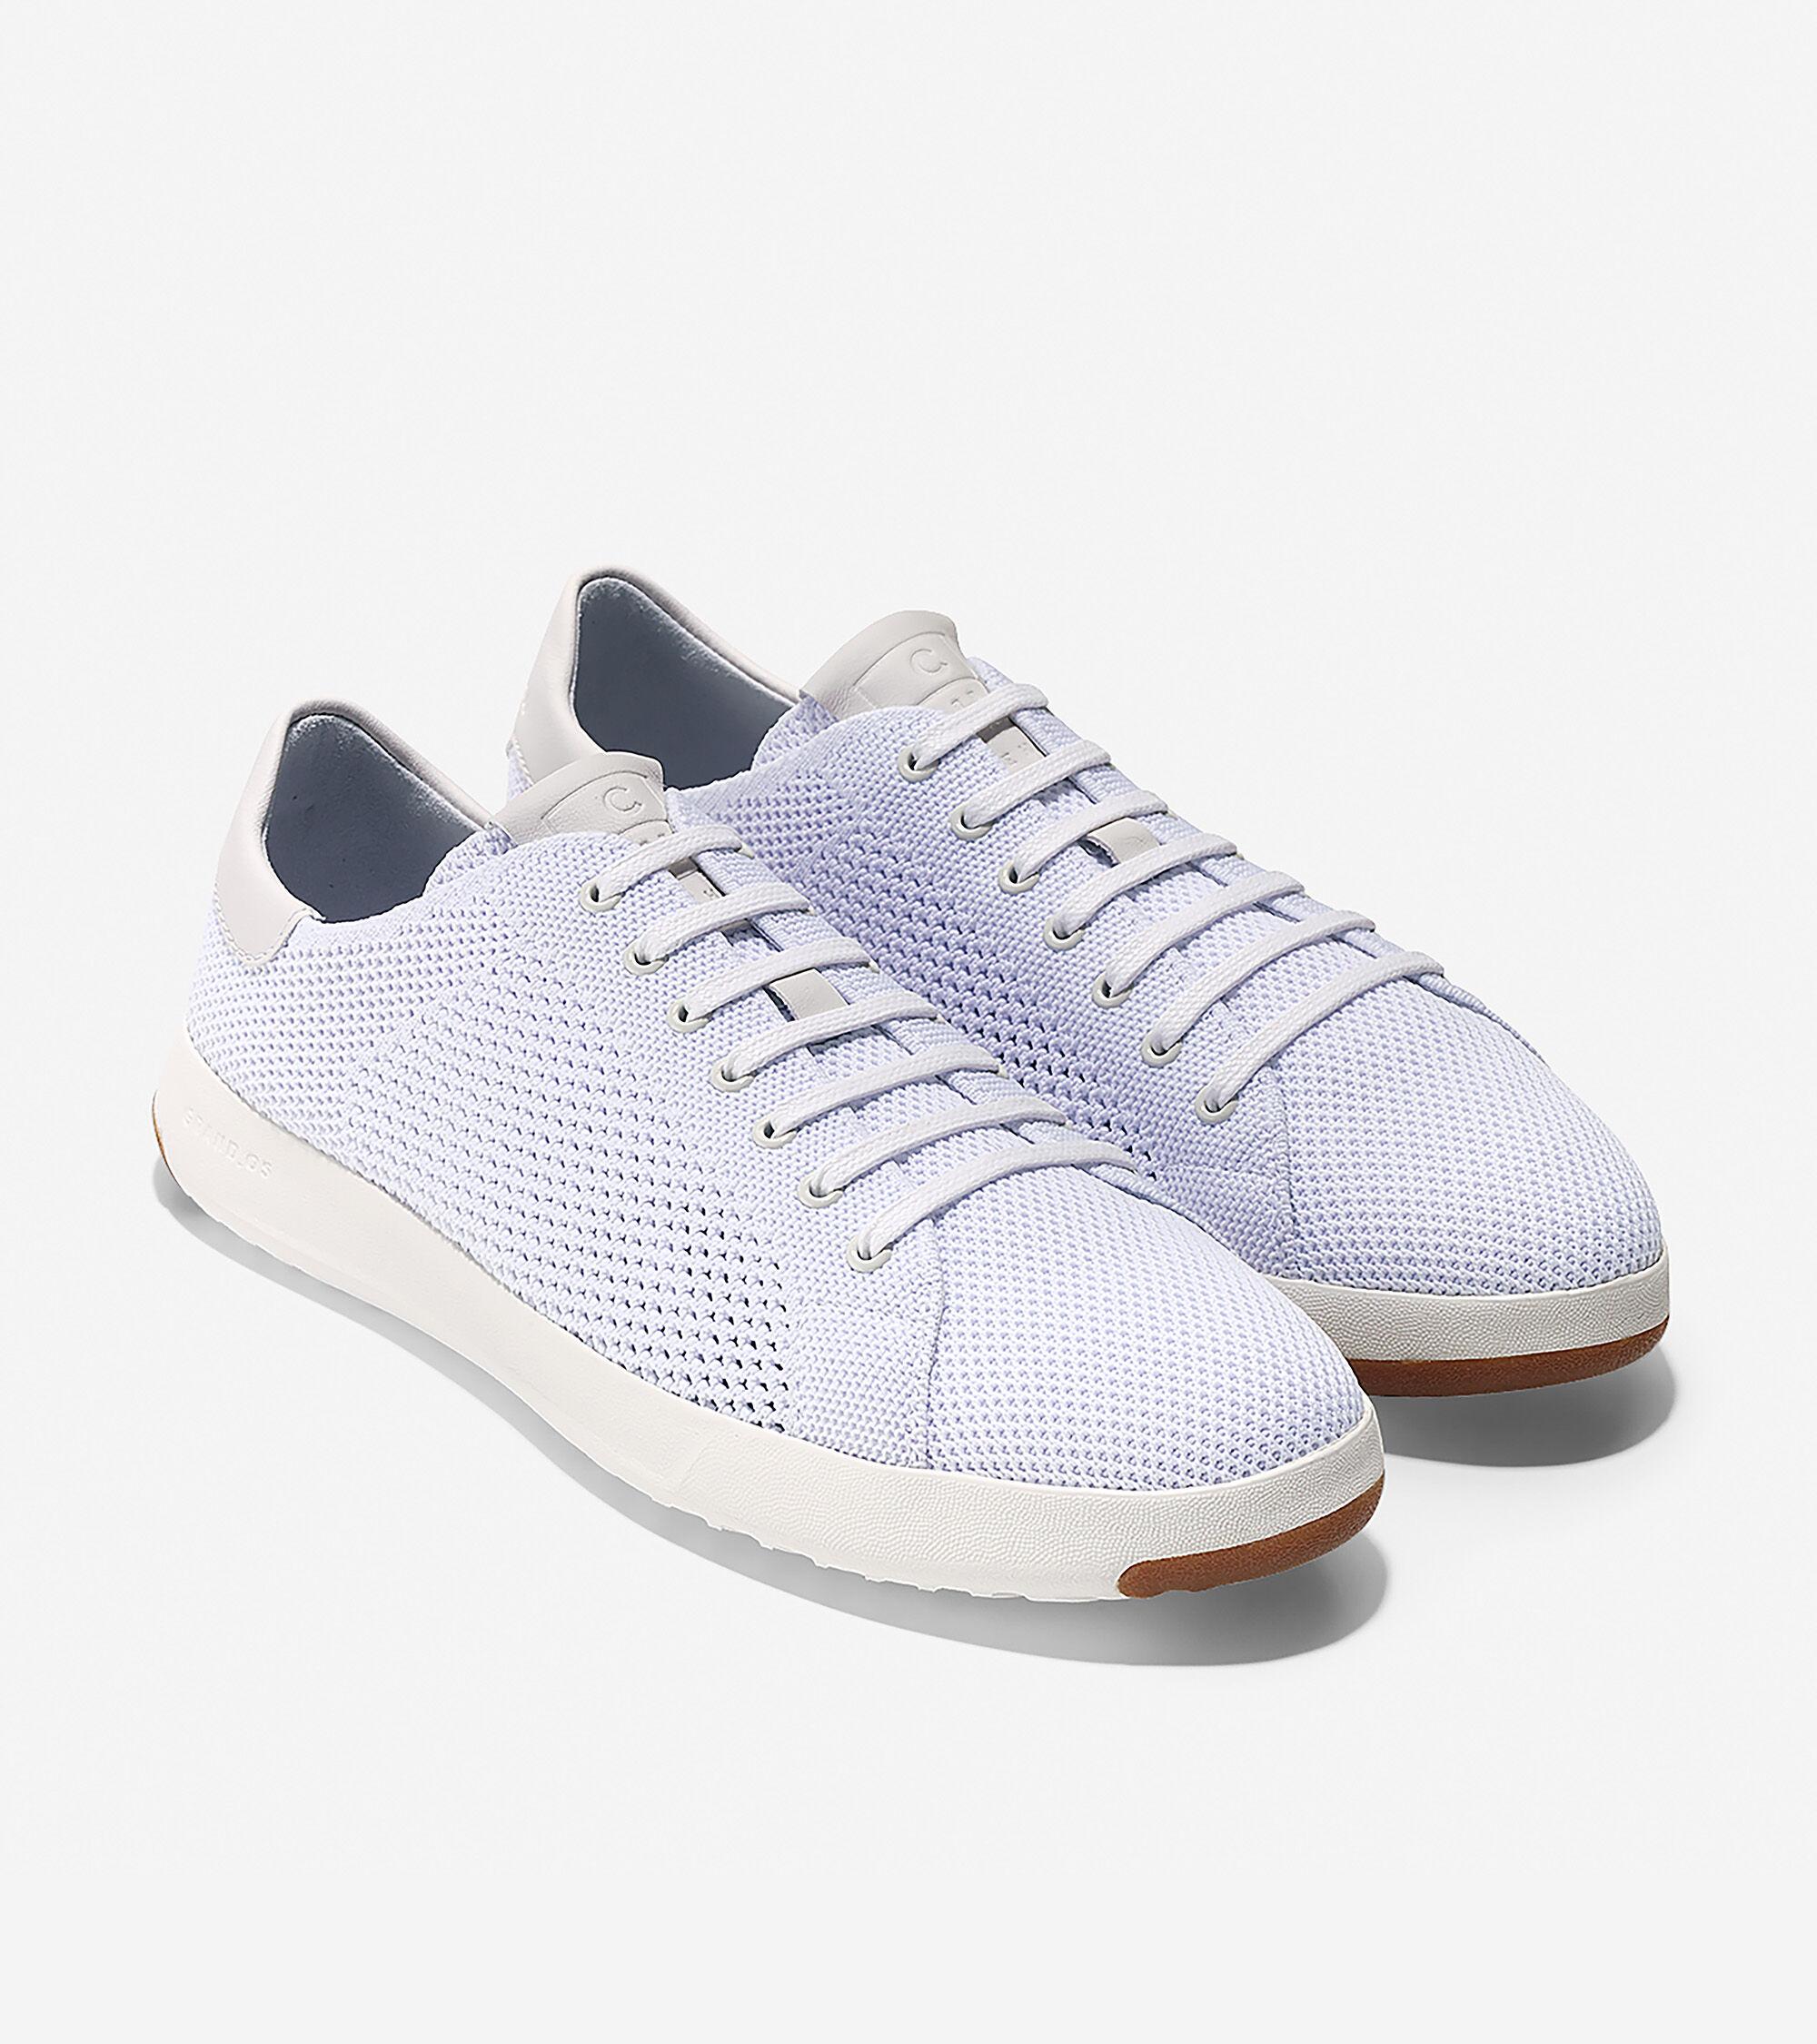 0166659766d1 Men s GrandPro Stitchlite Tennis Sneakers in Optic White